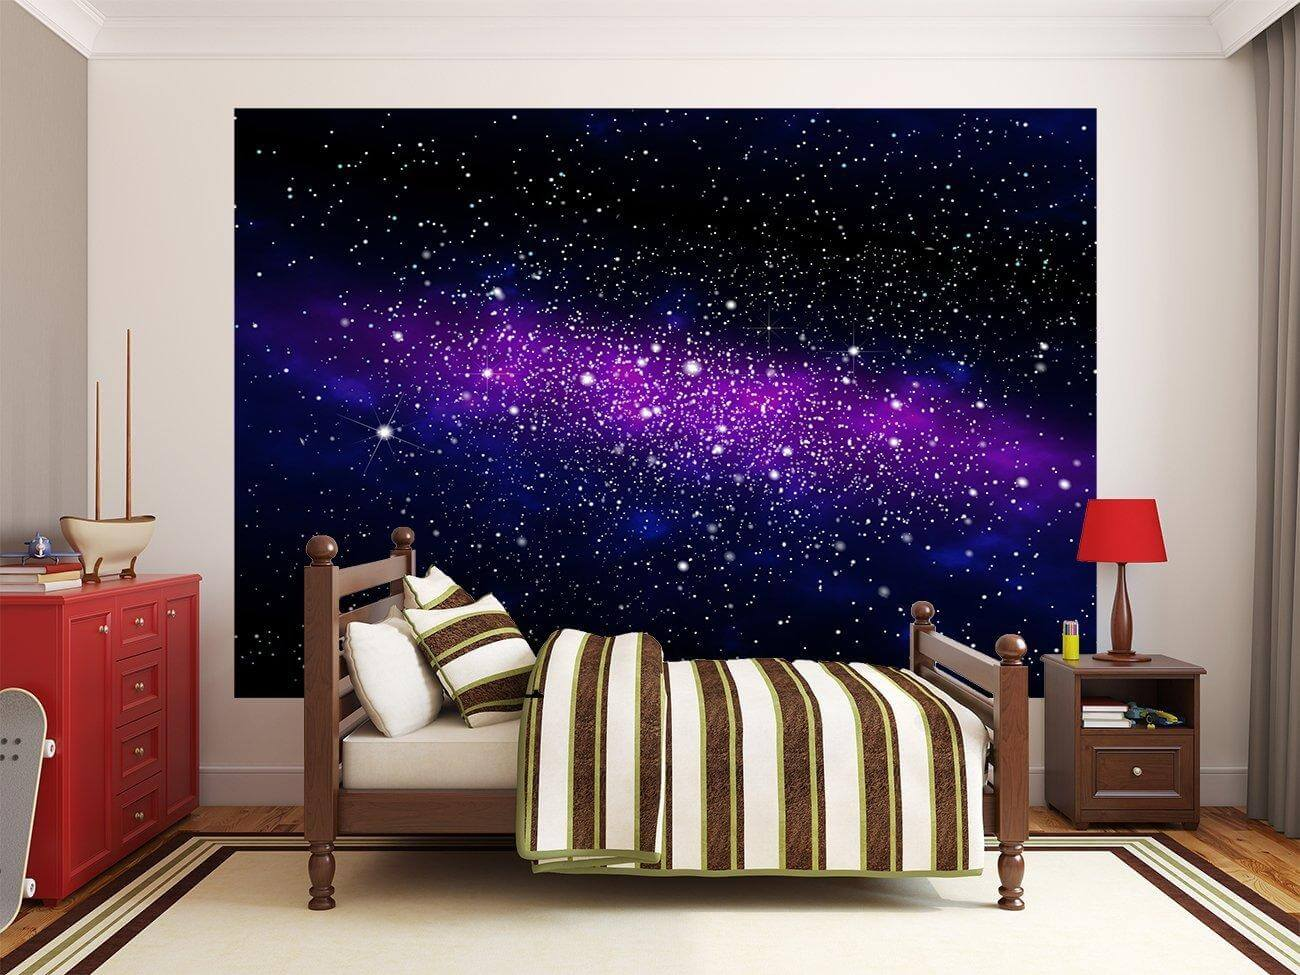 fototapete galaxy dekotapete sternenhimmel welltall. Black Bedroom Furniture Sets. Home Design Ideas